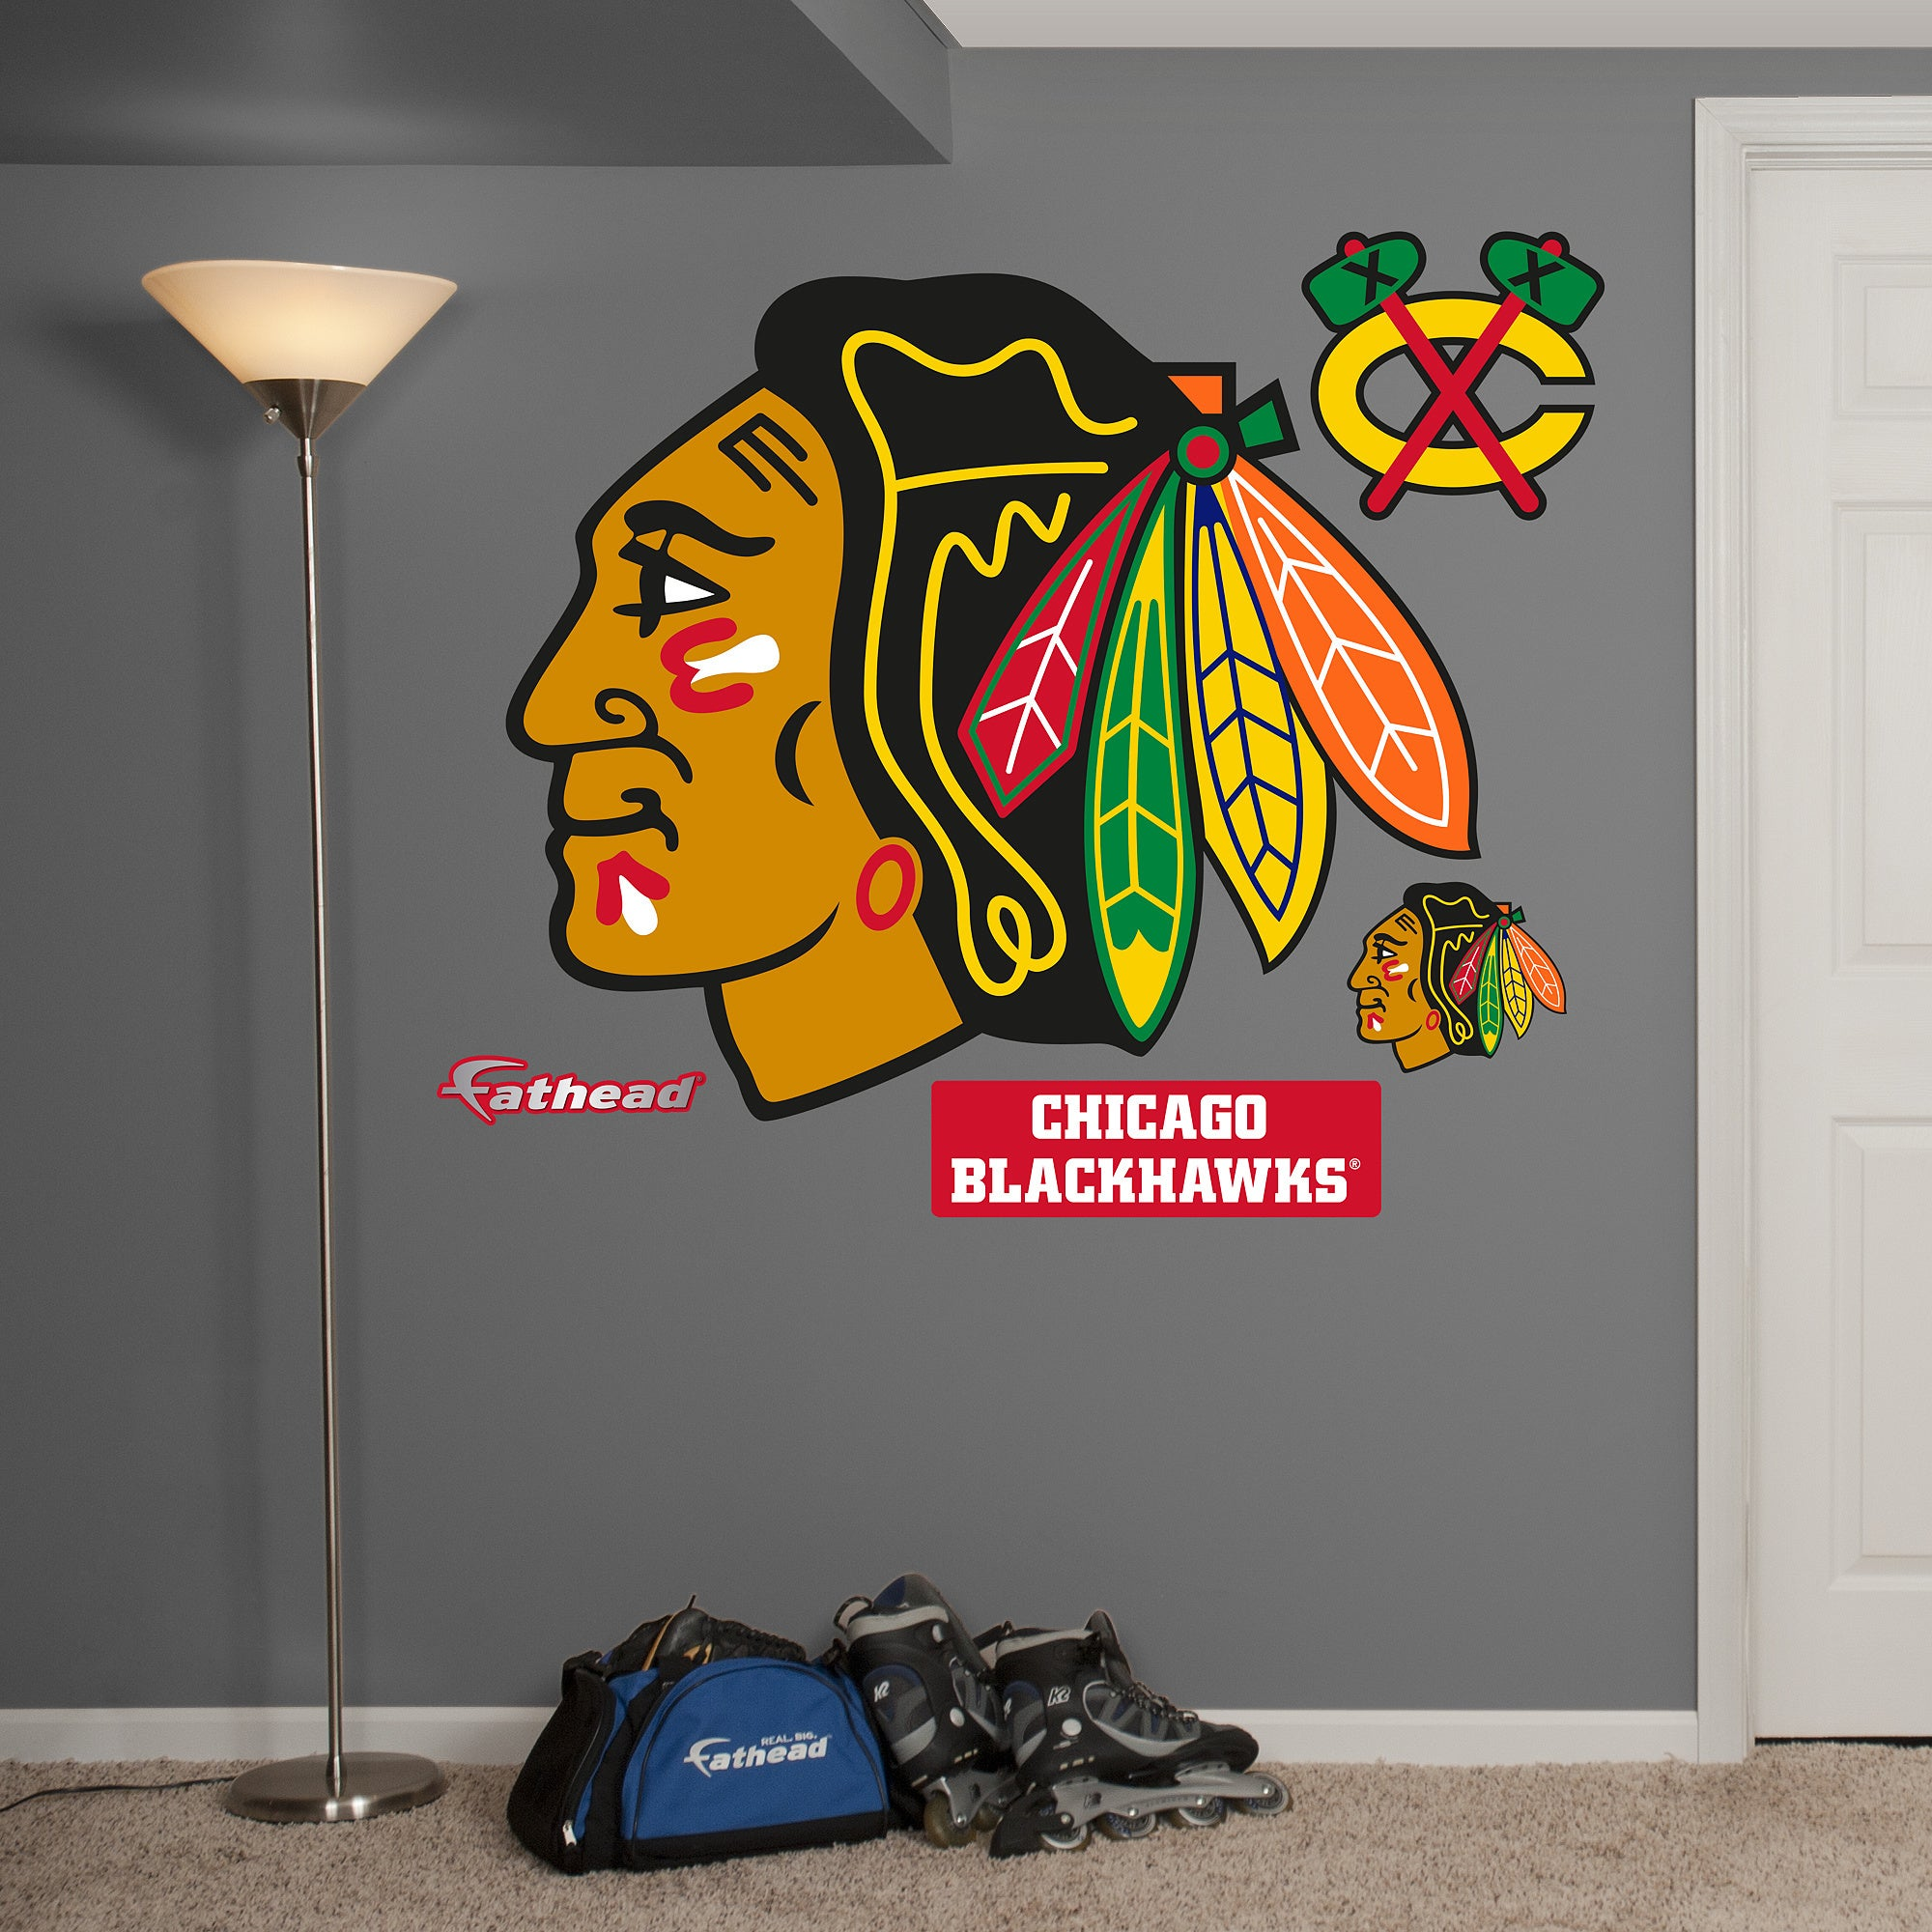 Fathead chicago blackhawks logo wall decals